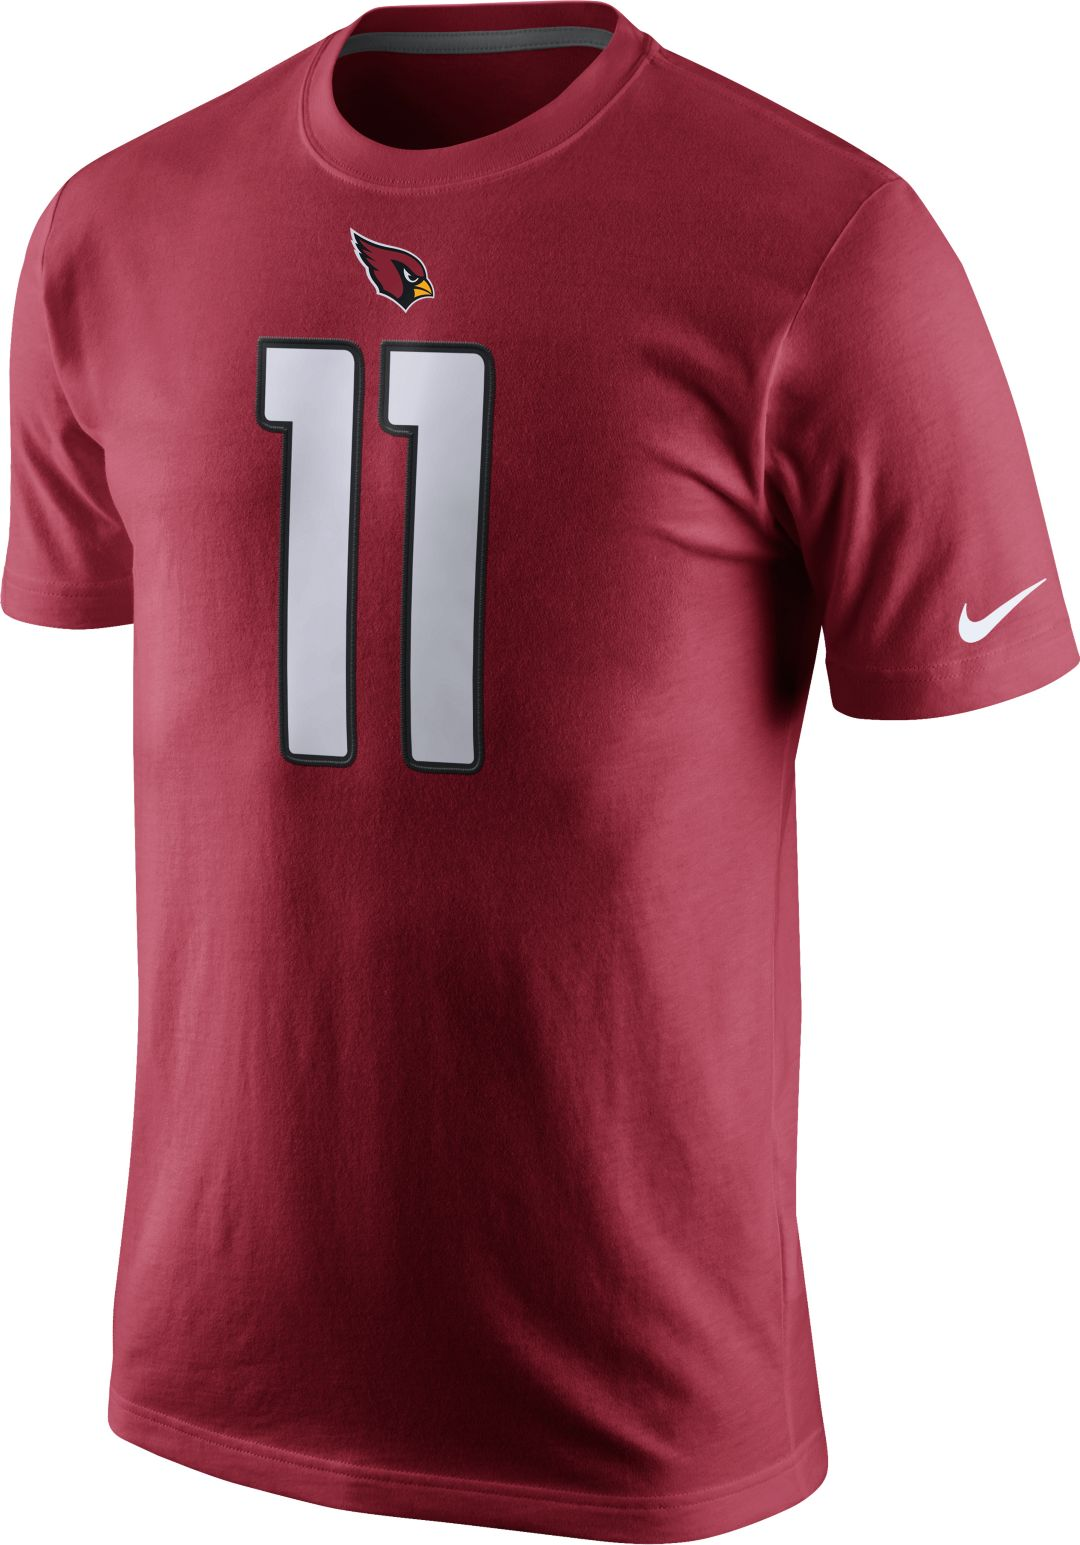 929982f56fa Nike Men's Arizona Cardinals Larry Fitzgerald #11 Pride Red T-Shirt ...